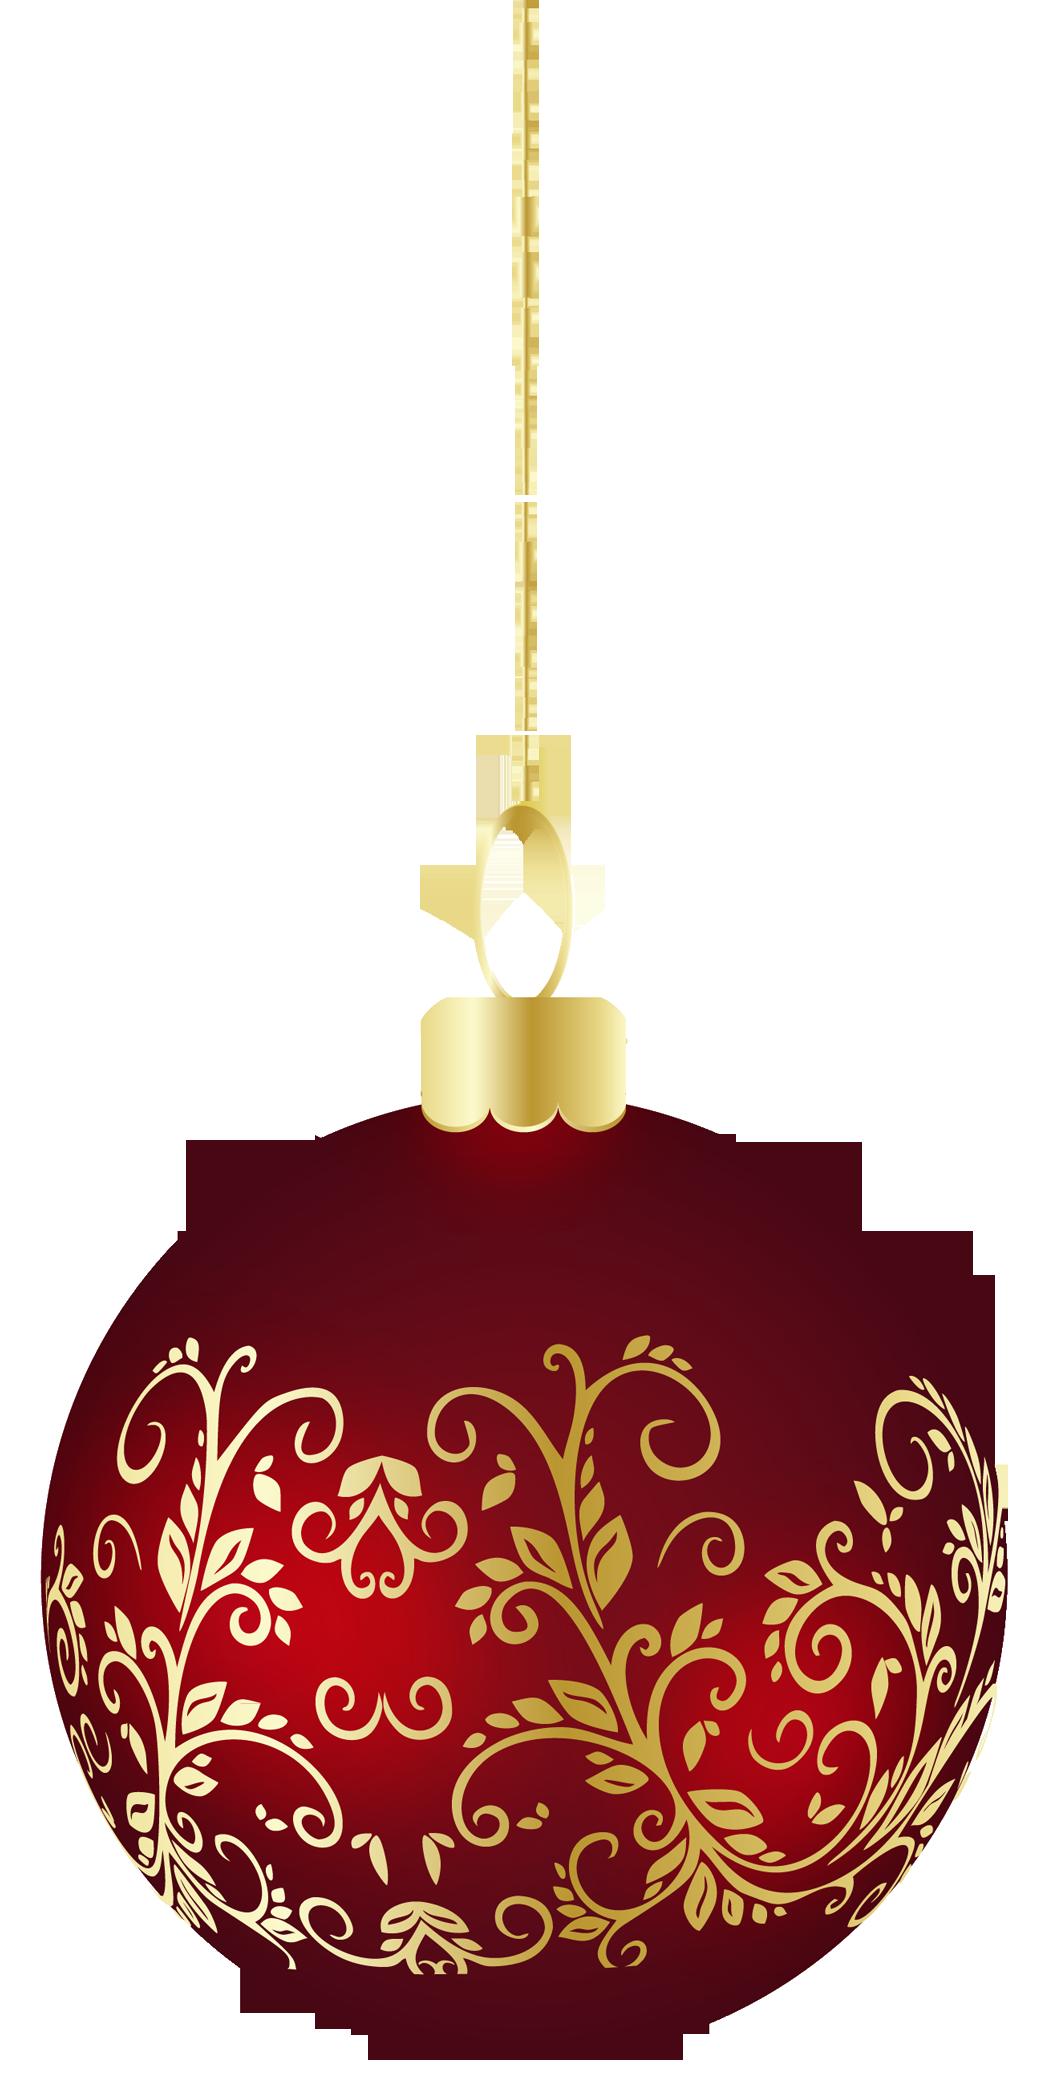 Christmas Ornaments clipart large Large Christmas Transparent Ornament Christmas